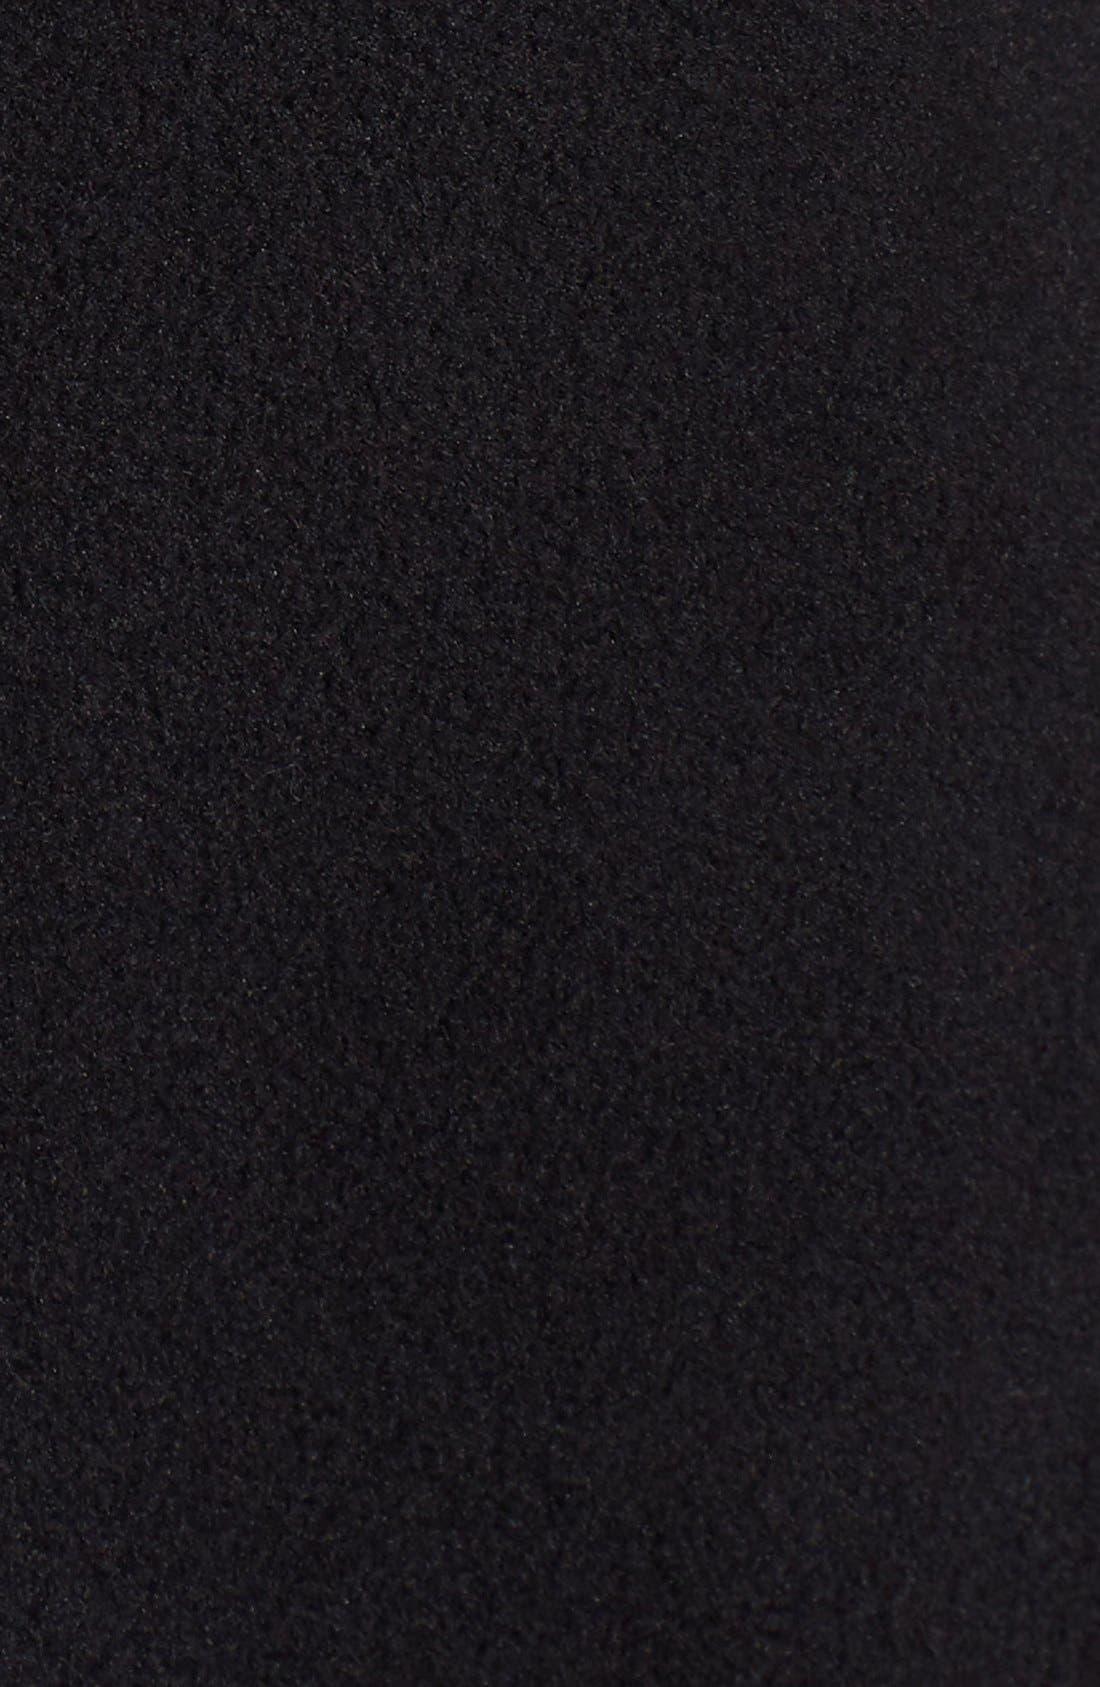 Sitka Fleece Jacket,                             Alternate thumbnail 5, color,                             001